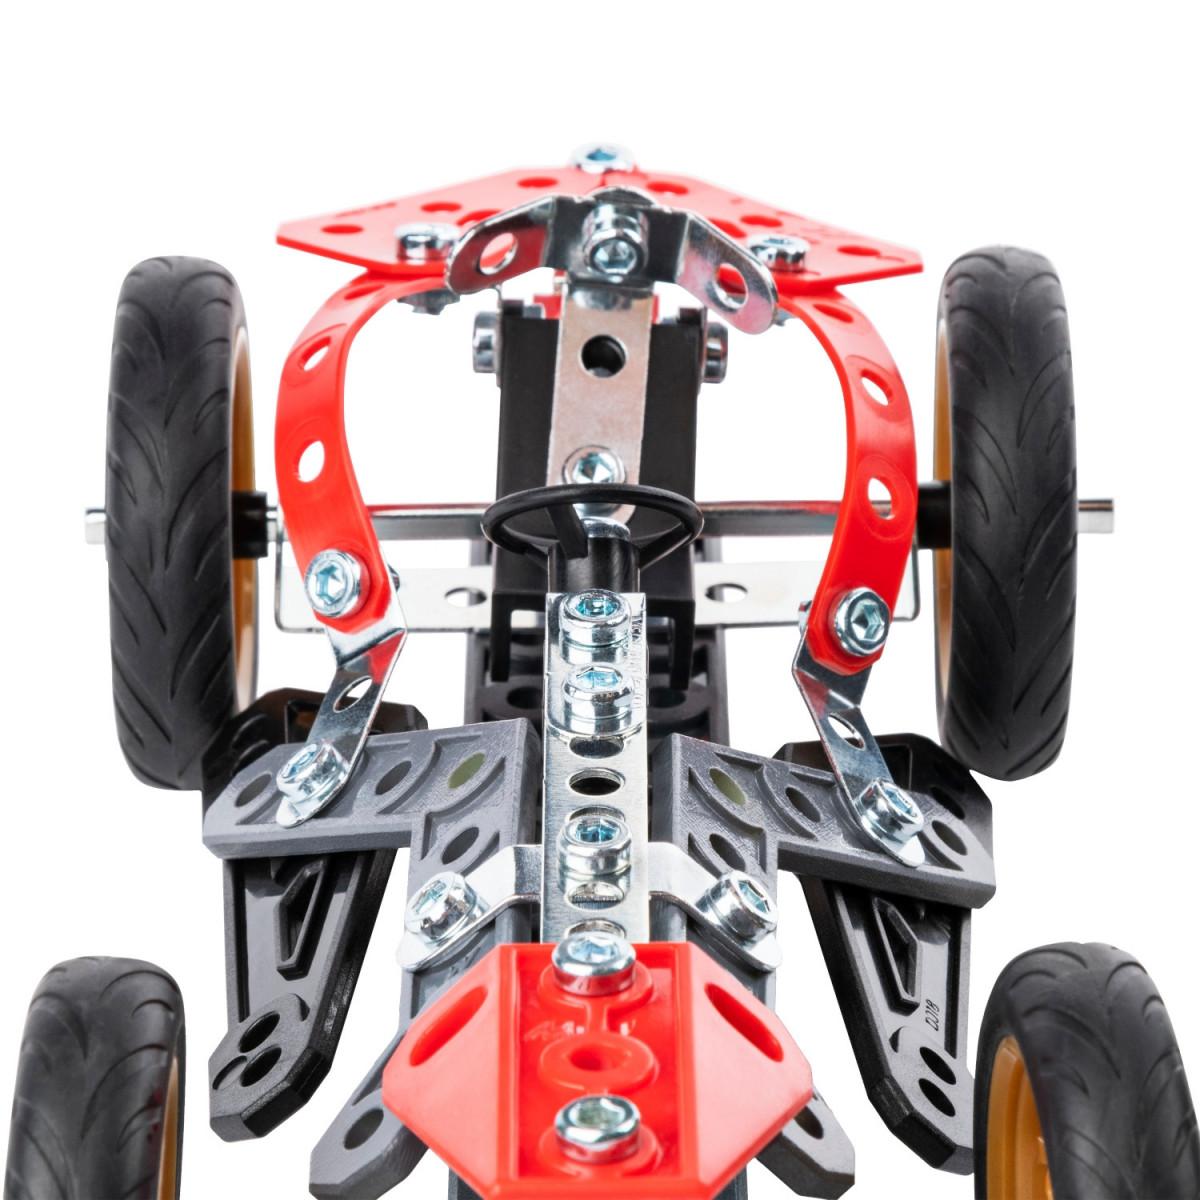 6053371 VOITURE ET MOTO 5 MODELES MECCANO BOLIDE